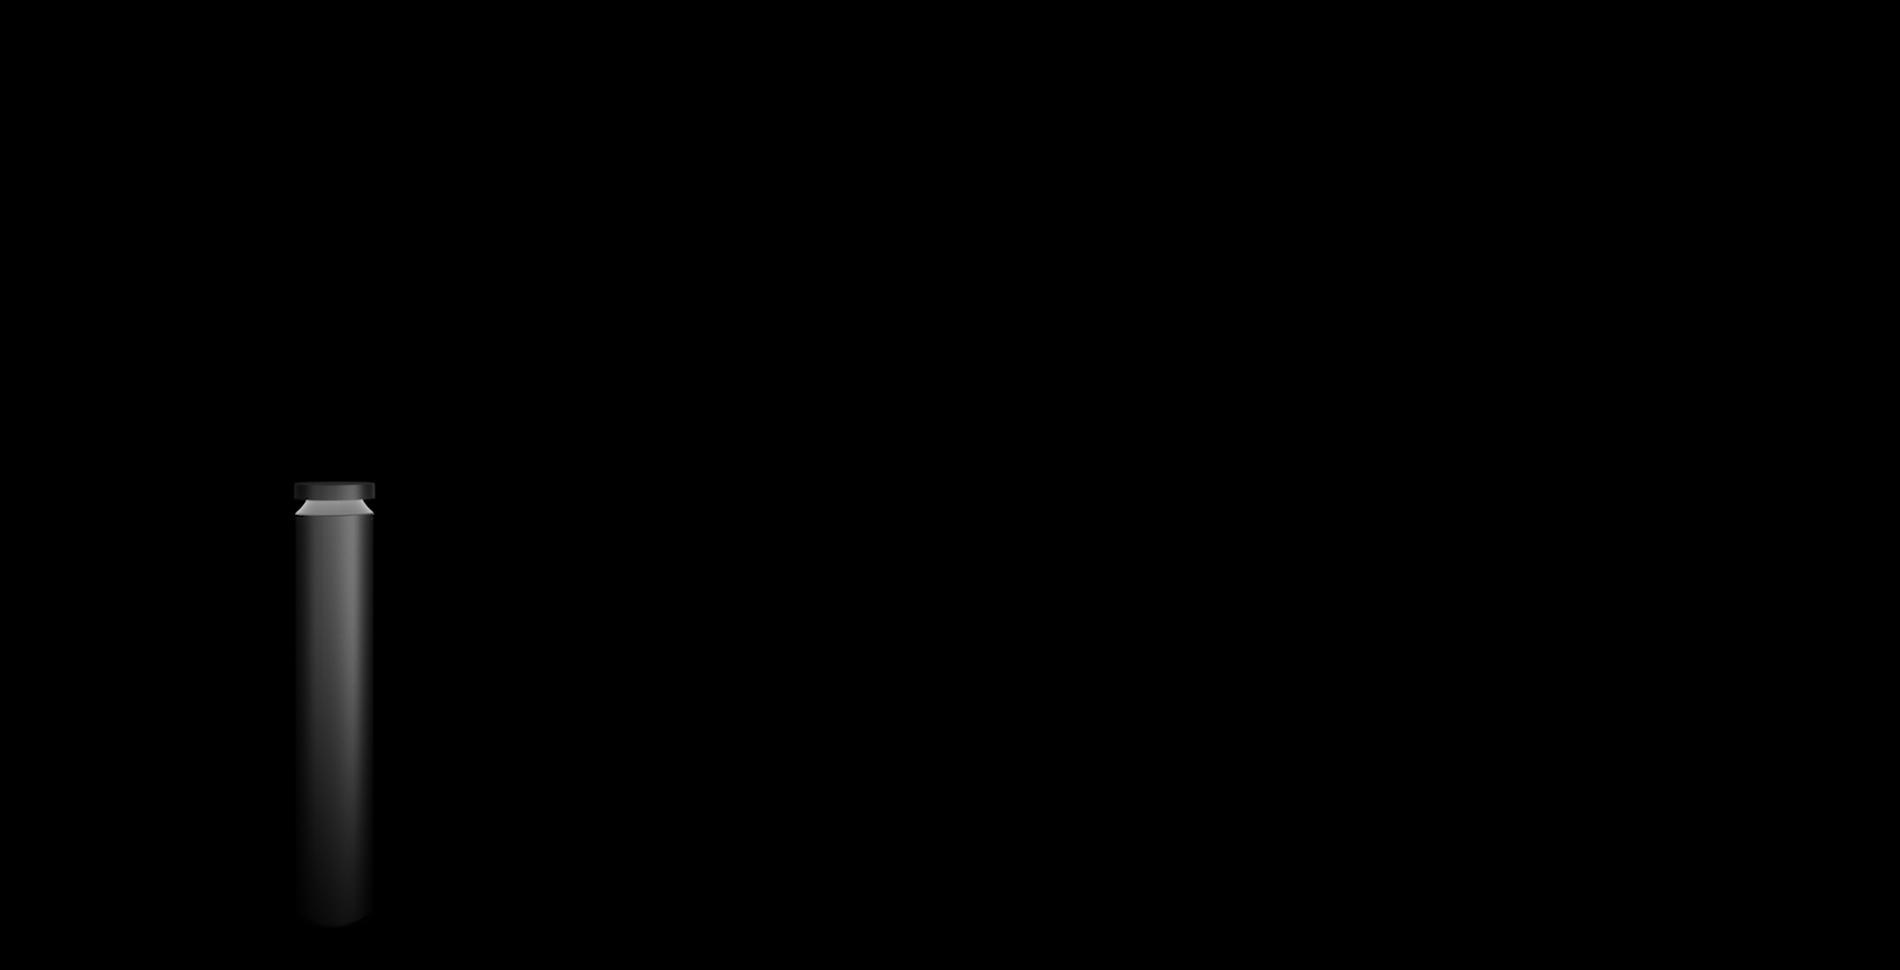 Sequenza-0225